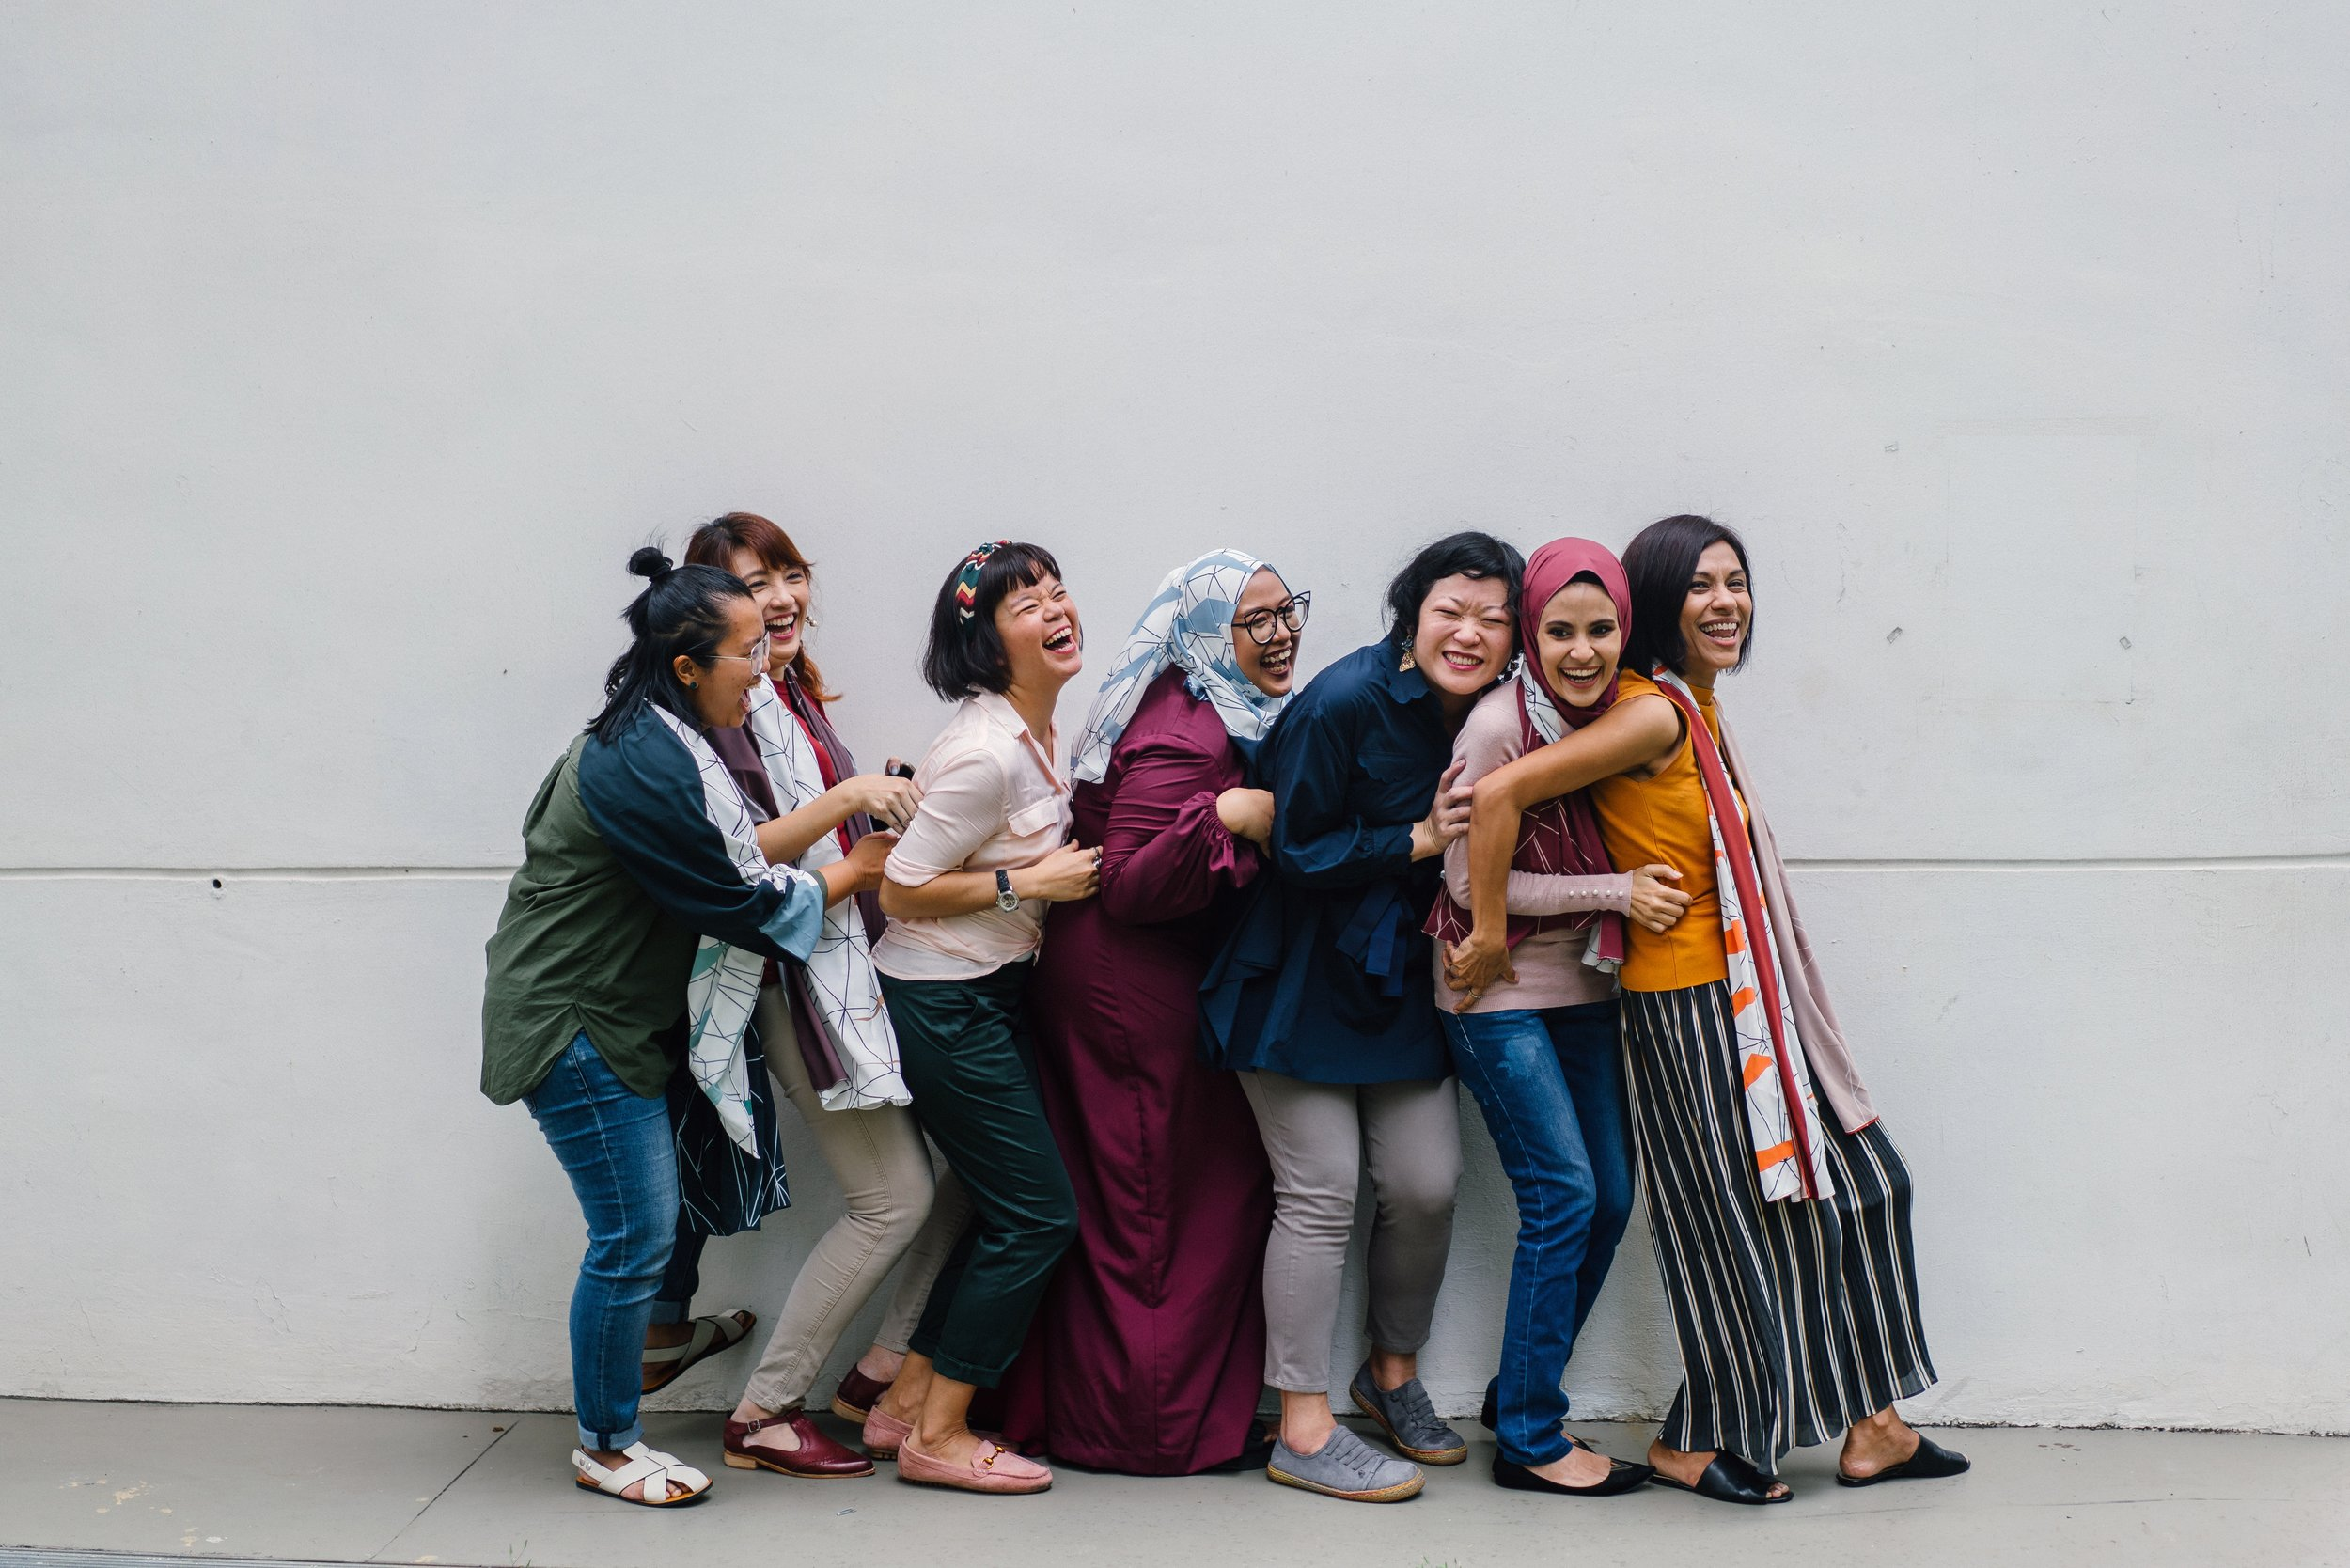 casual-diversity-female-1206059 (1).jpg